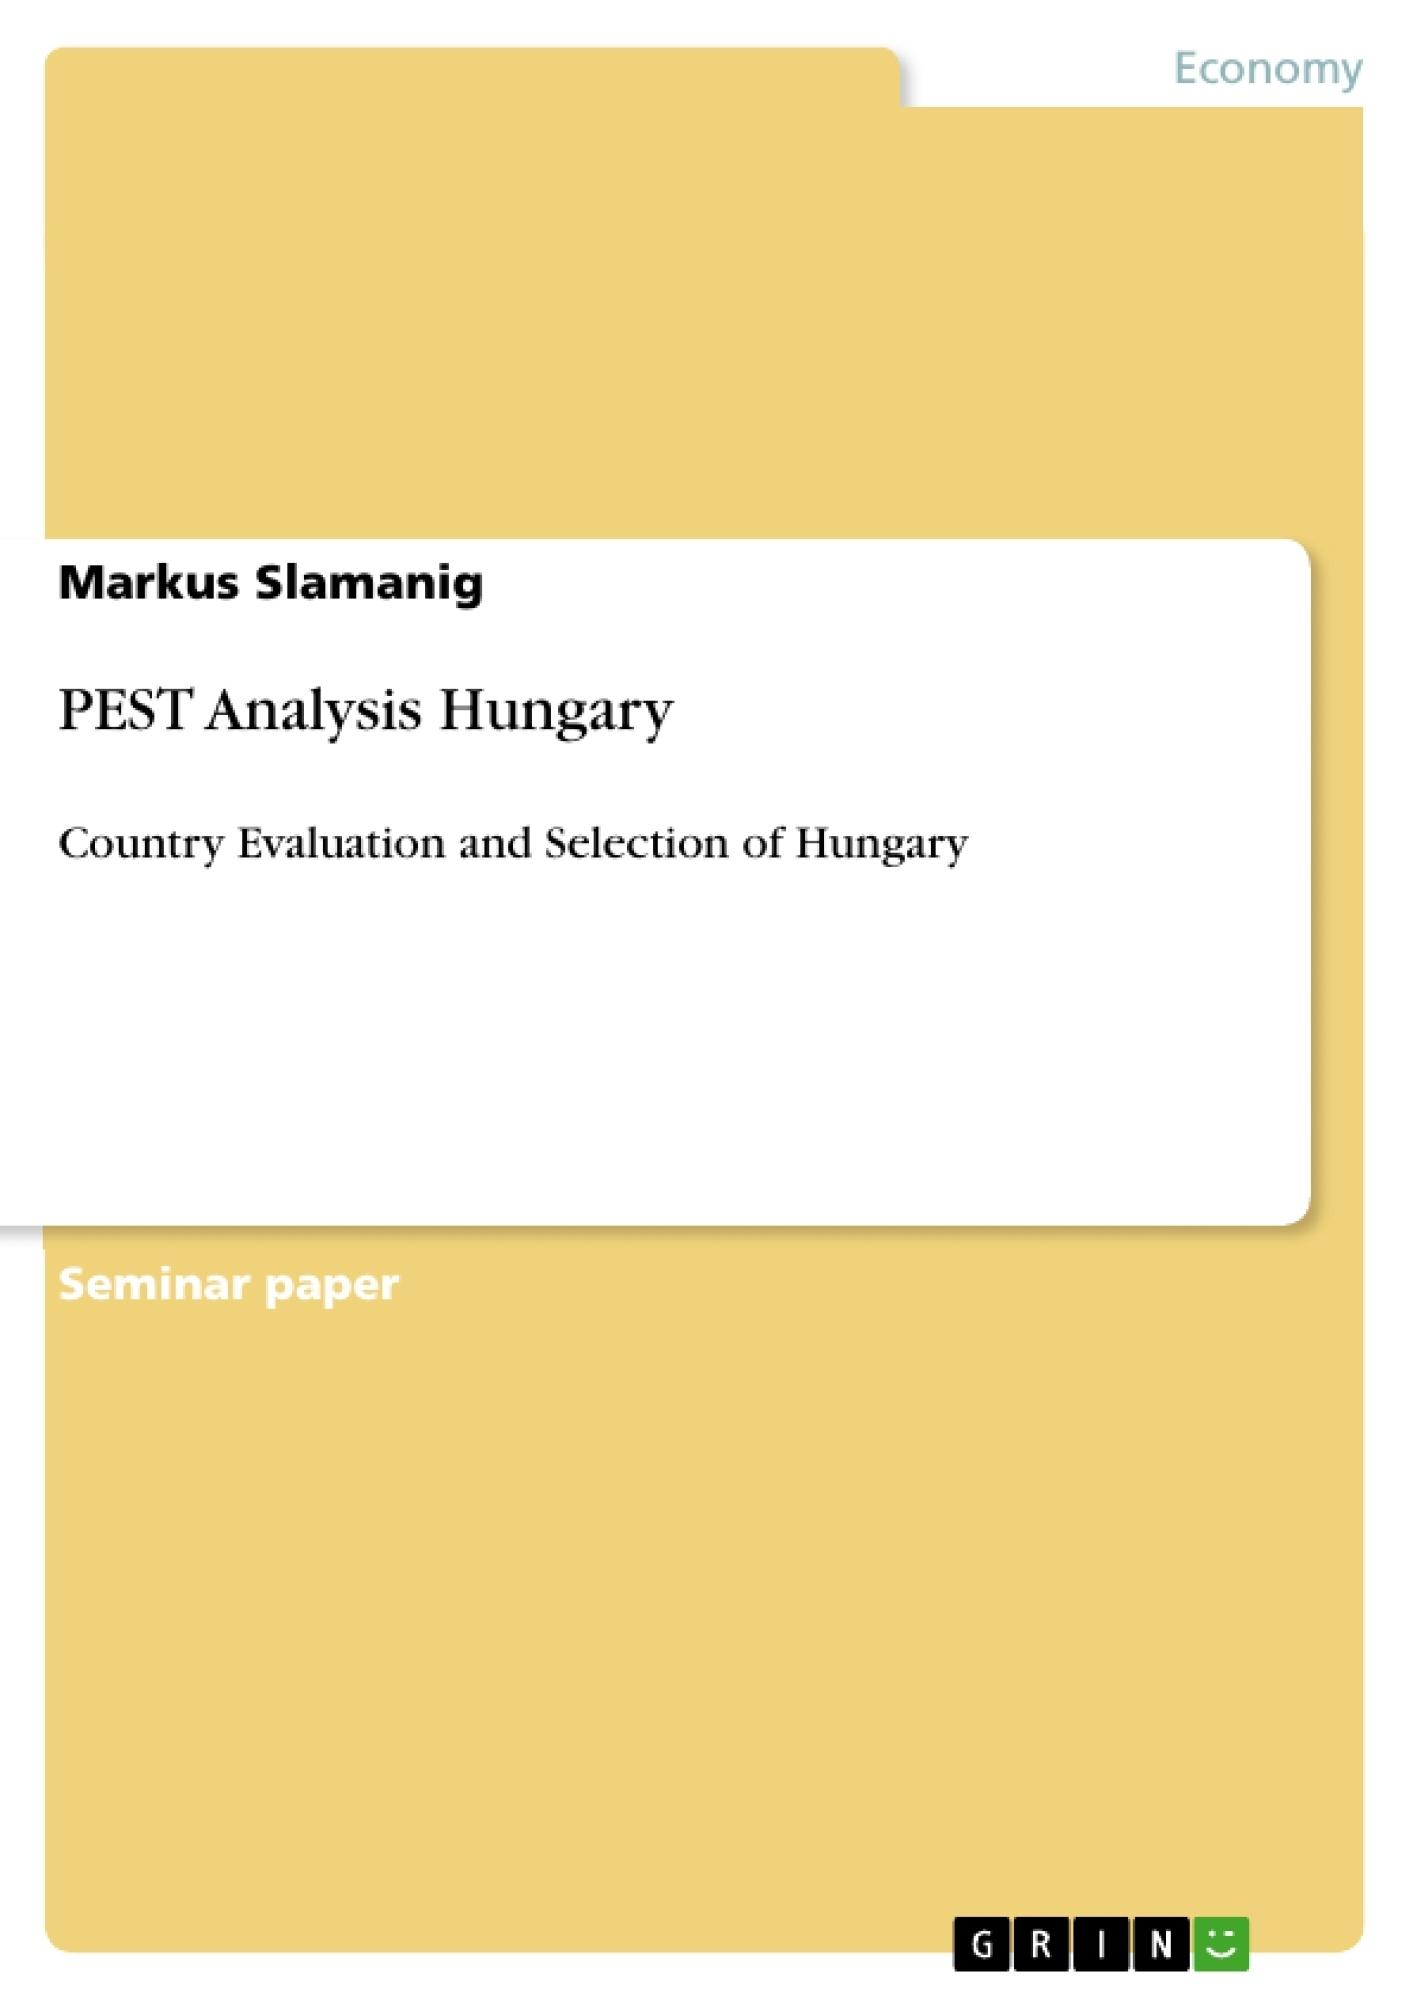 Title: PEST Analysis Hungary